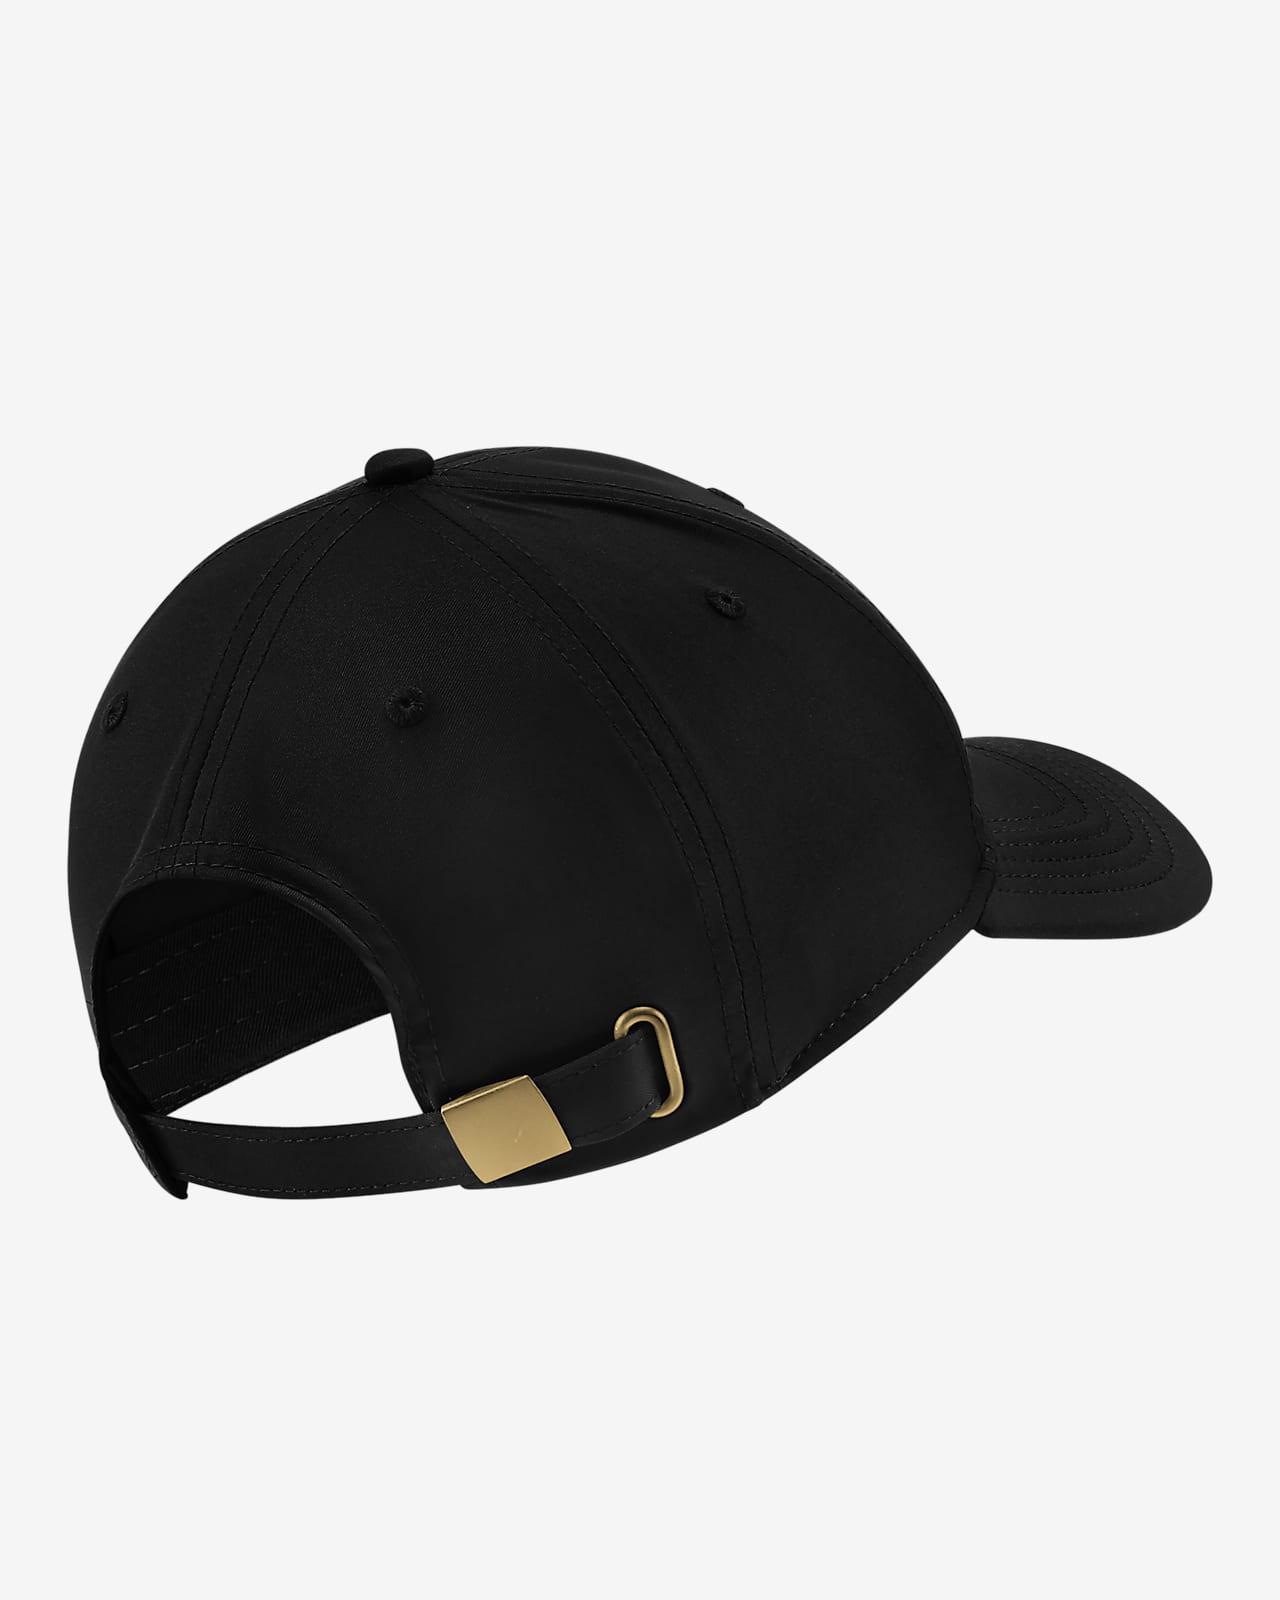 Nike NSW Aerobill Heritage 86 Metal Cap 942212-010 Sports Ball Cap Headwear